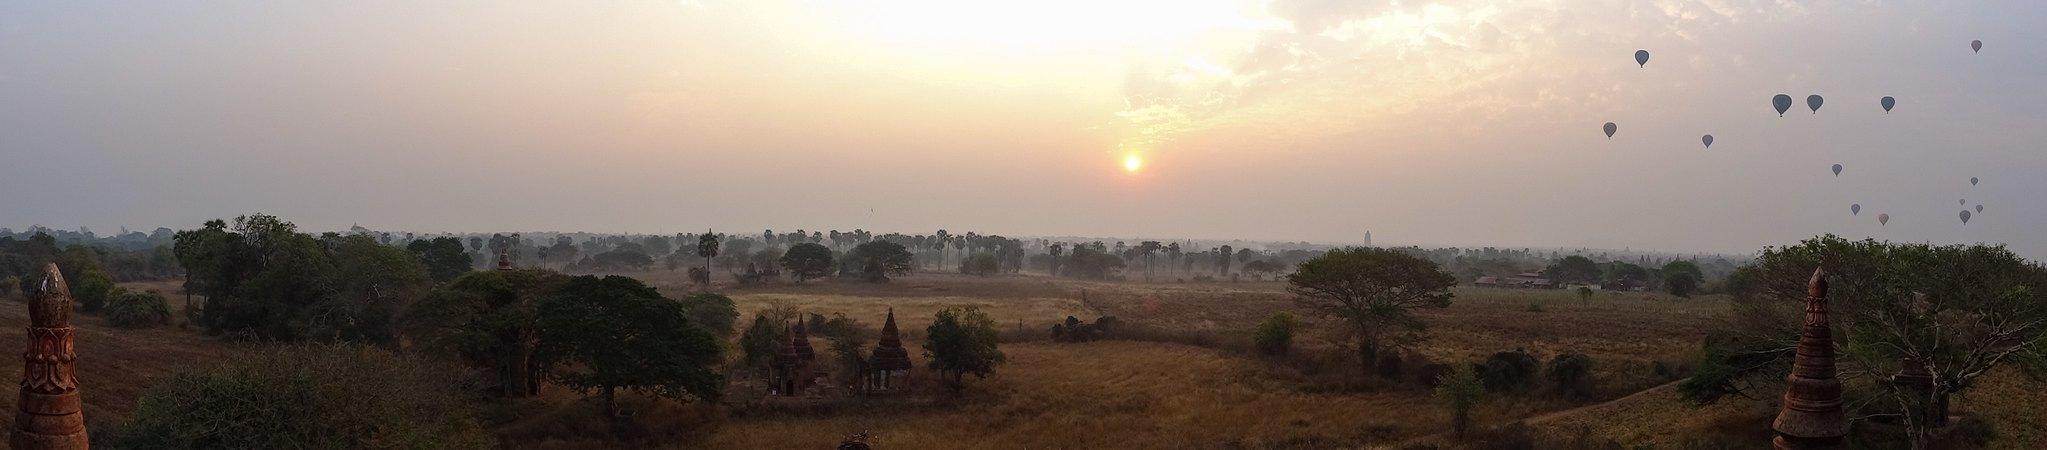 Sunrise balloon panorama